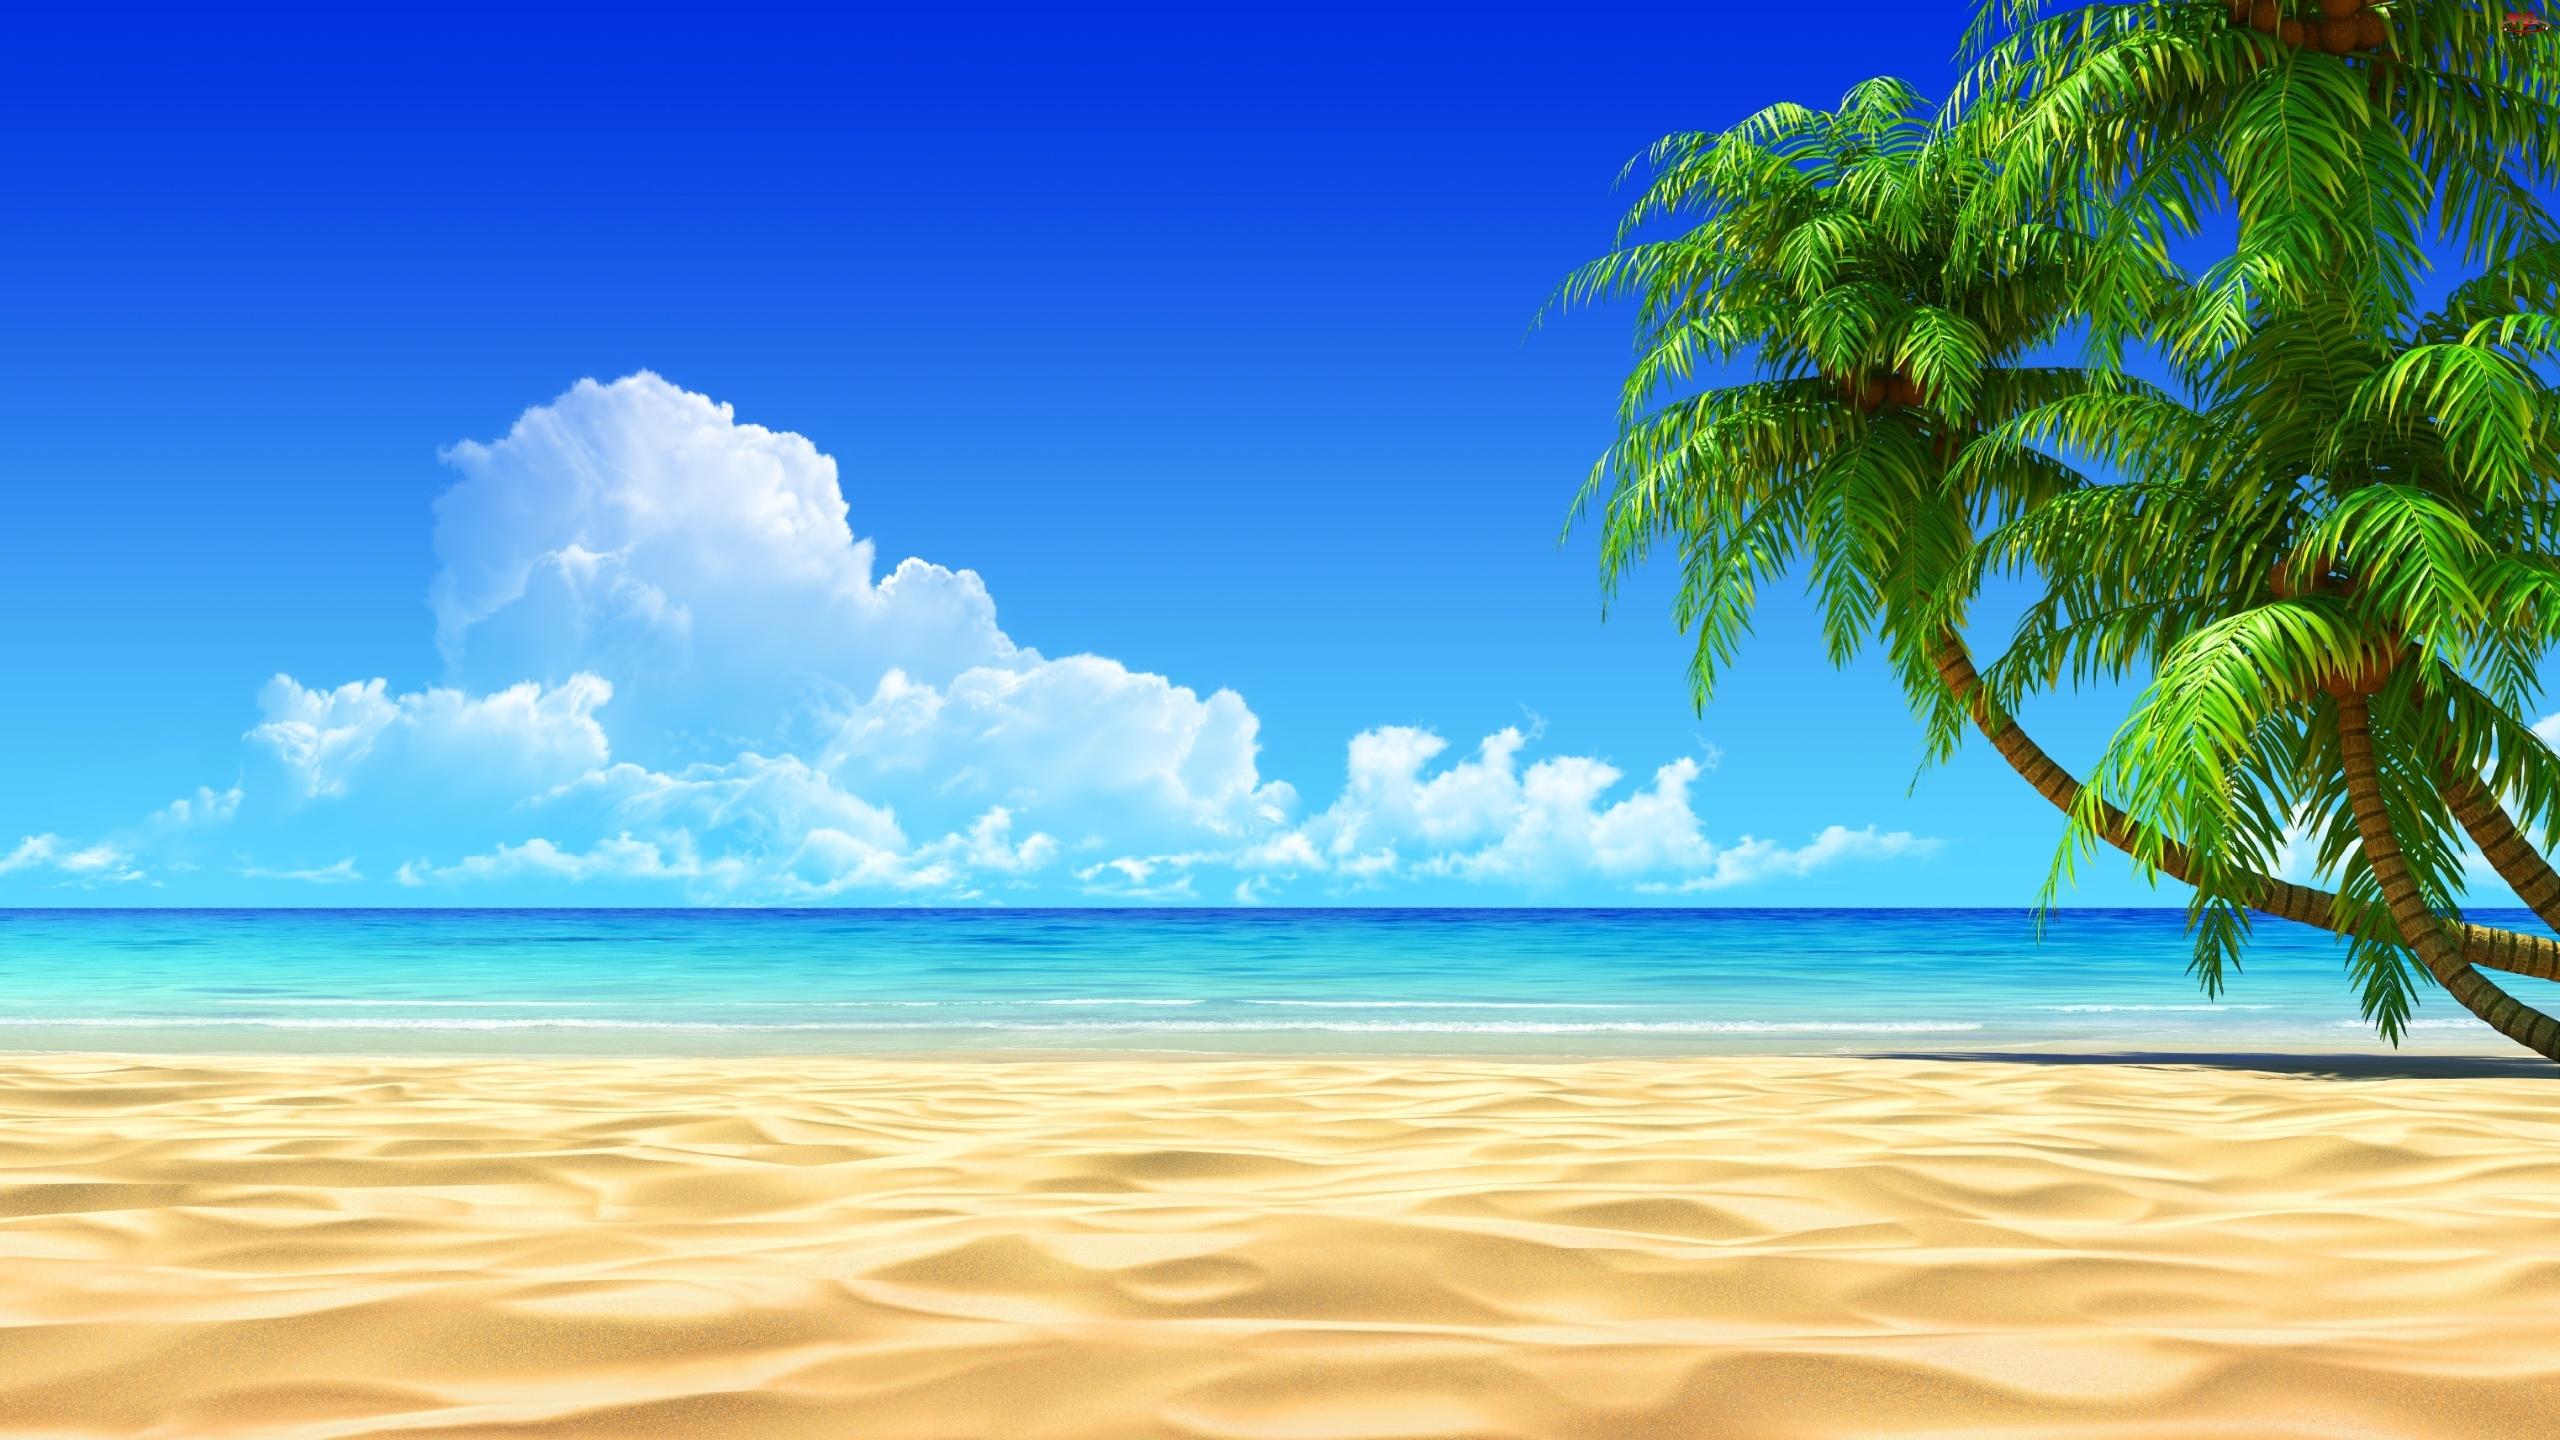 73 Beach Backgrounds On Wallpapersafari